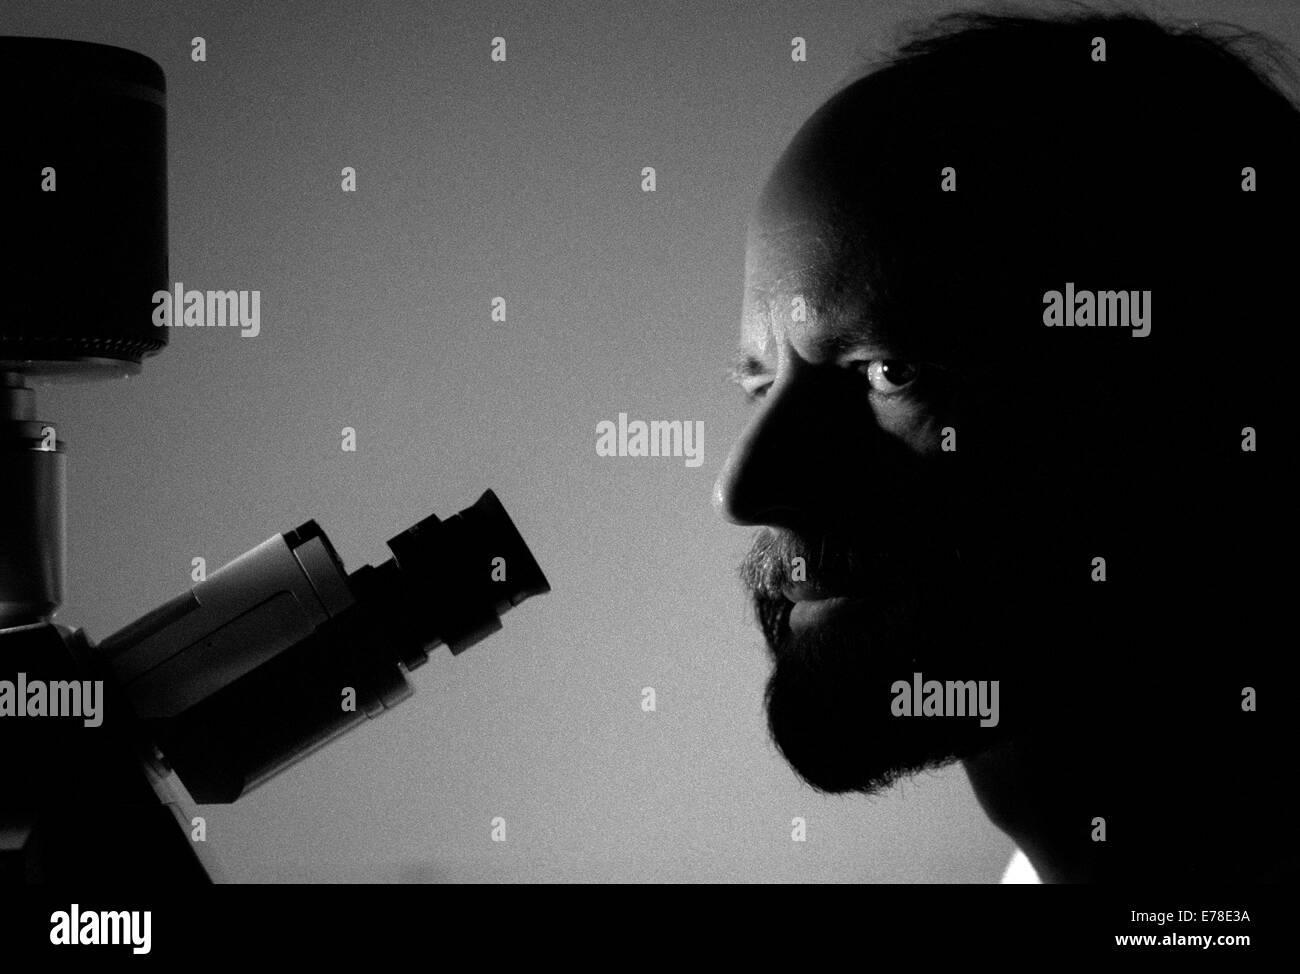 PROFESSOR HUGH PELHAM. MOLECULAR BIOLOGIST AT MRC, CAMBRIDGE, ENGLAND. COPYRIGHT PHOTOGRAPH BY BRIAN HARRIS  © - Stock Image